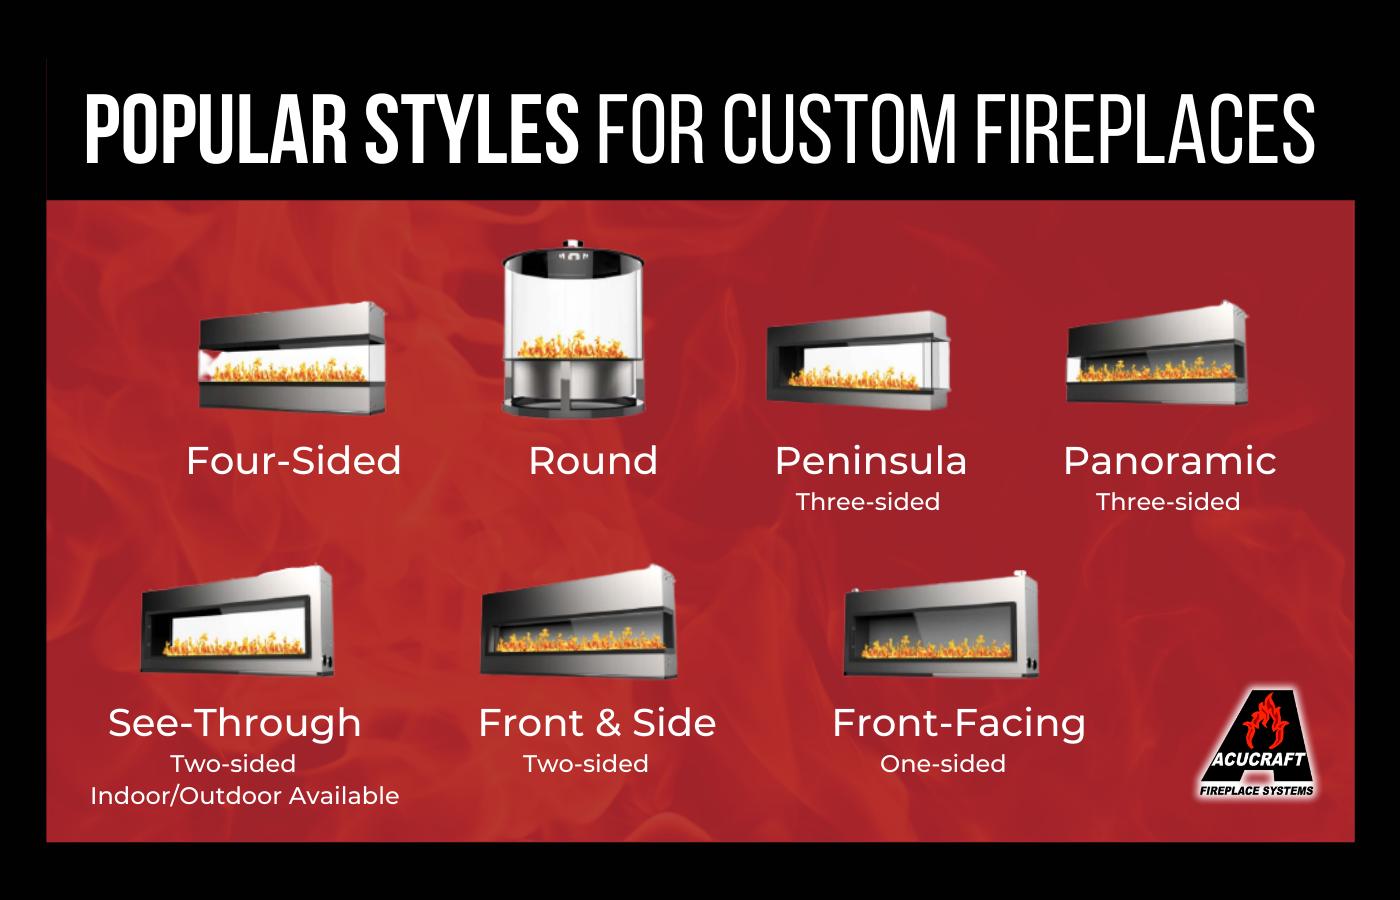 Infographic representing popular custom fireplace styles